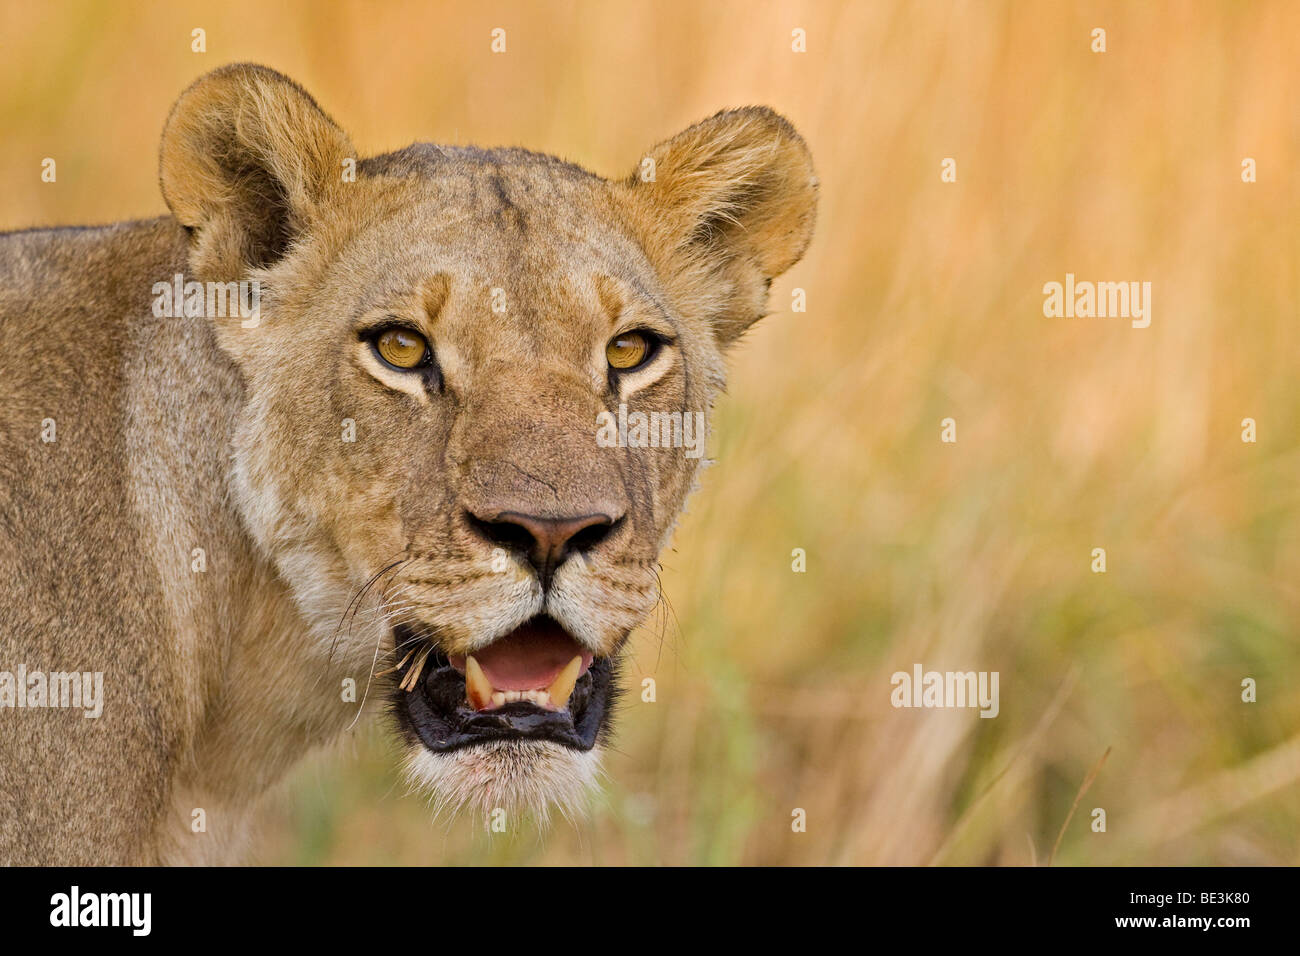 Lioness (Panthera leo), Moremi National Park, Okavango Delta, Botswana, Africa - Stock Image